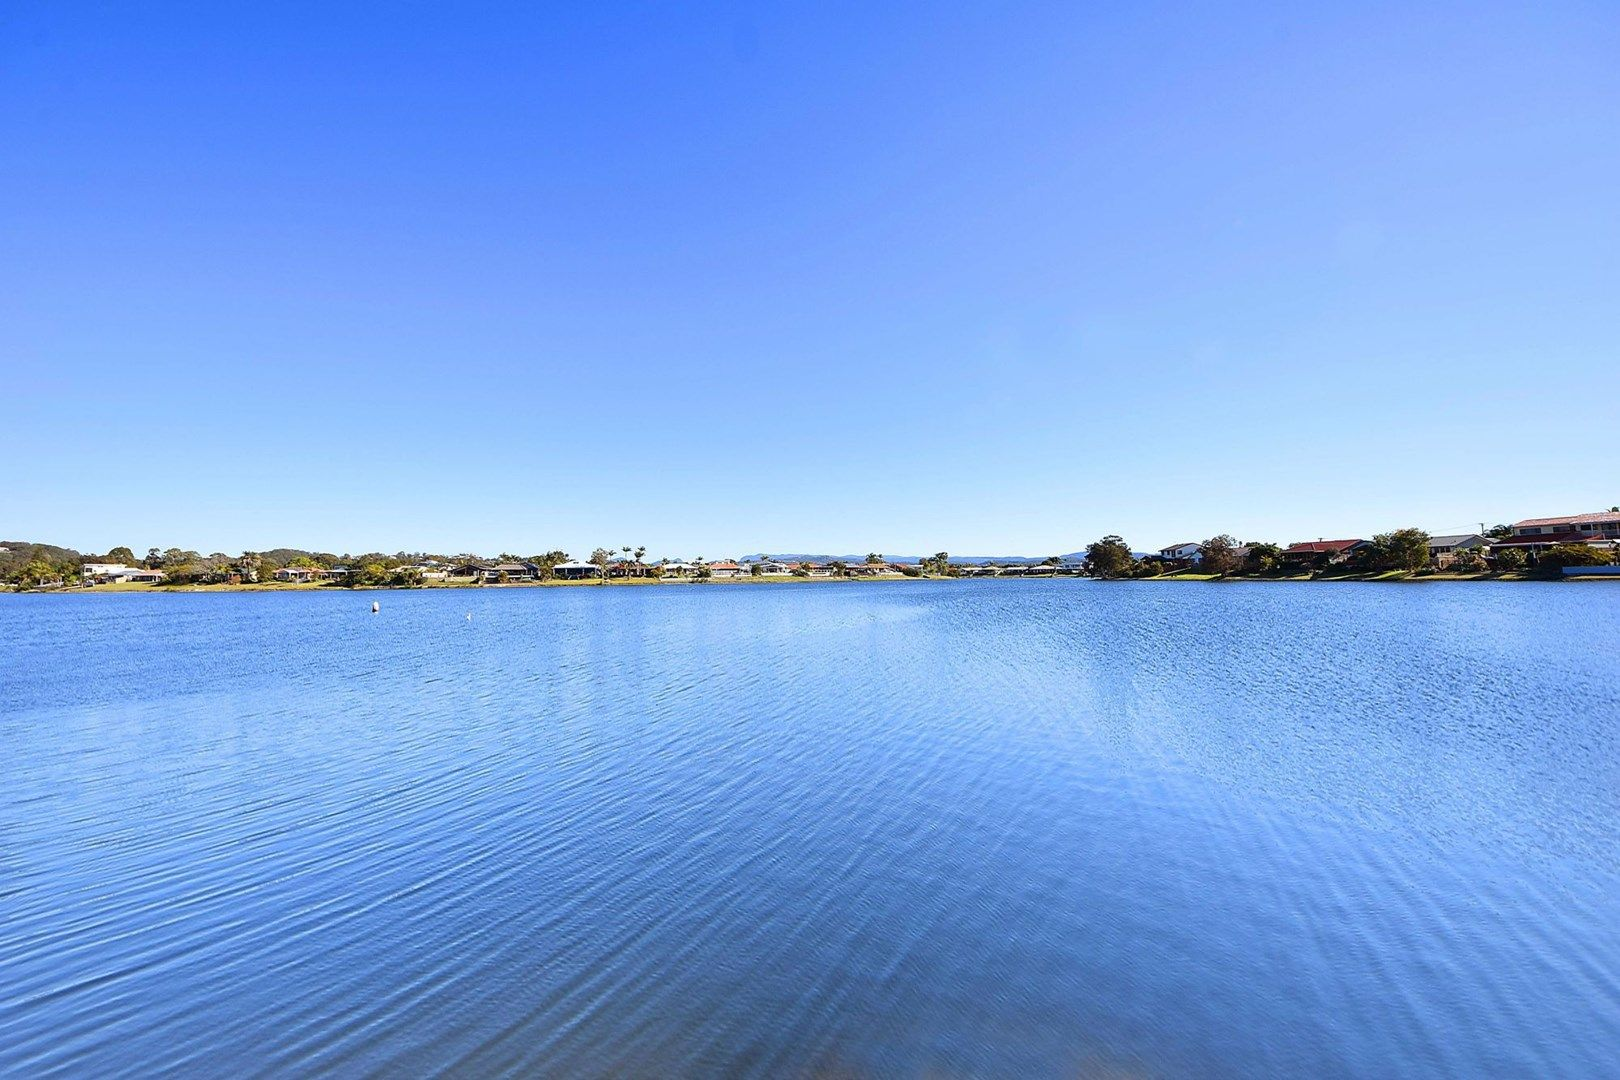 82 Burleigh Street, Burleigh Waters QLD 4220, Image 0